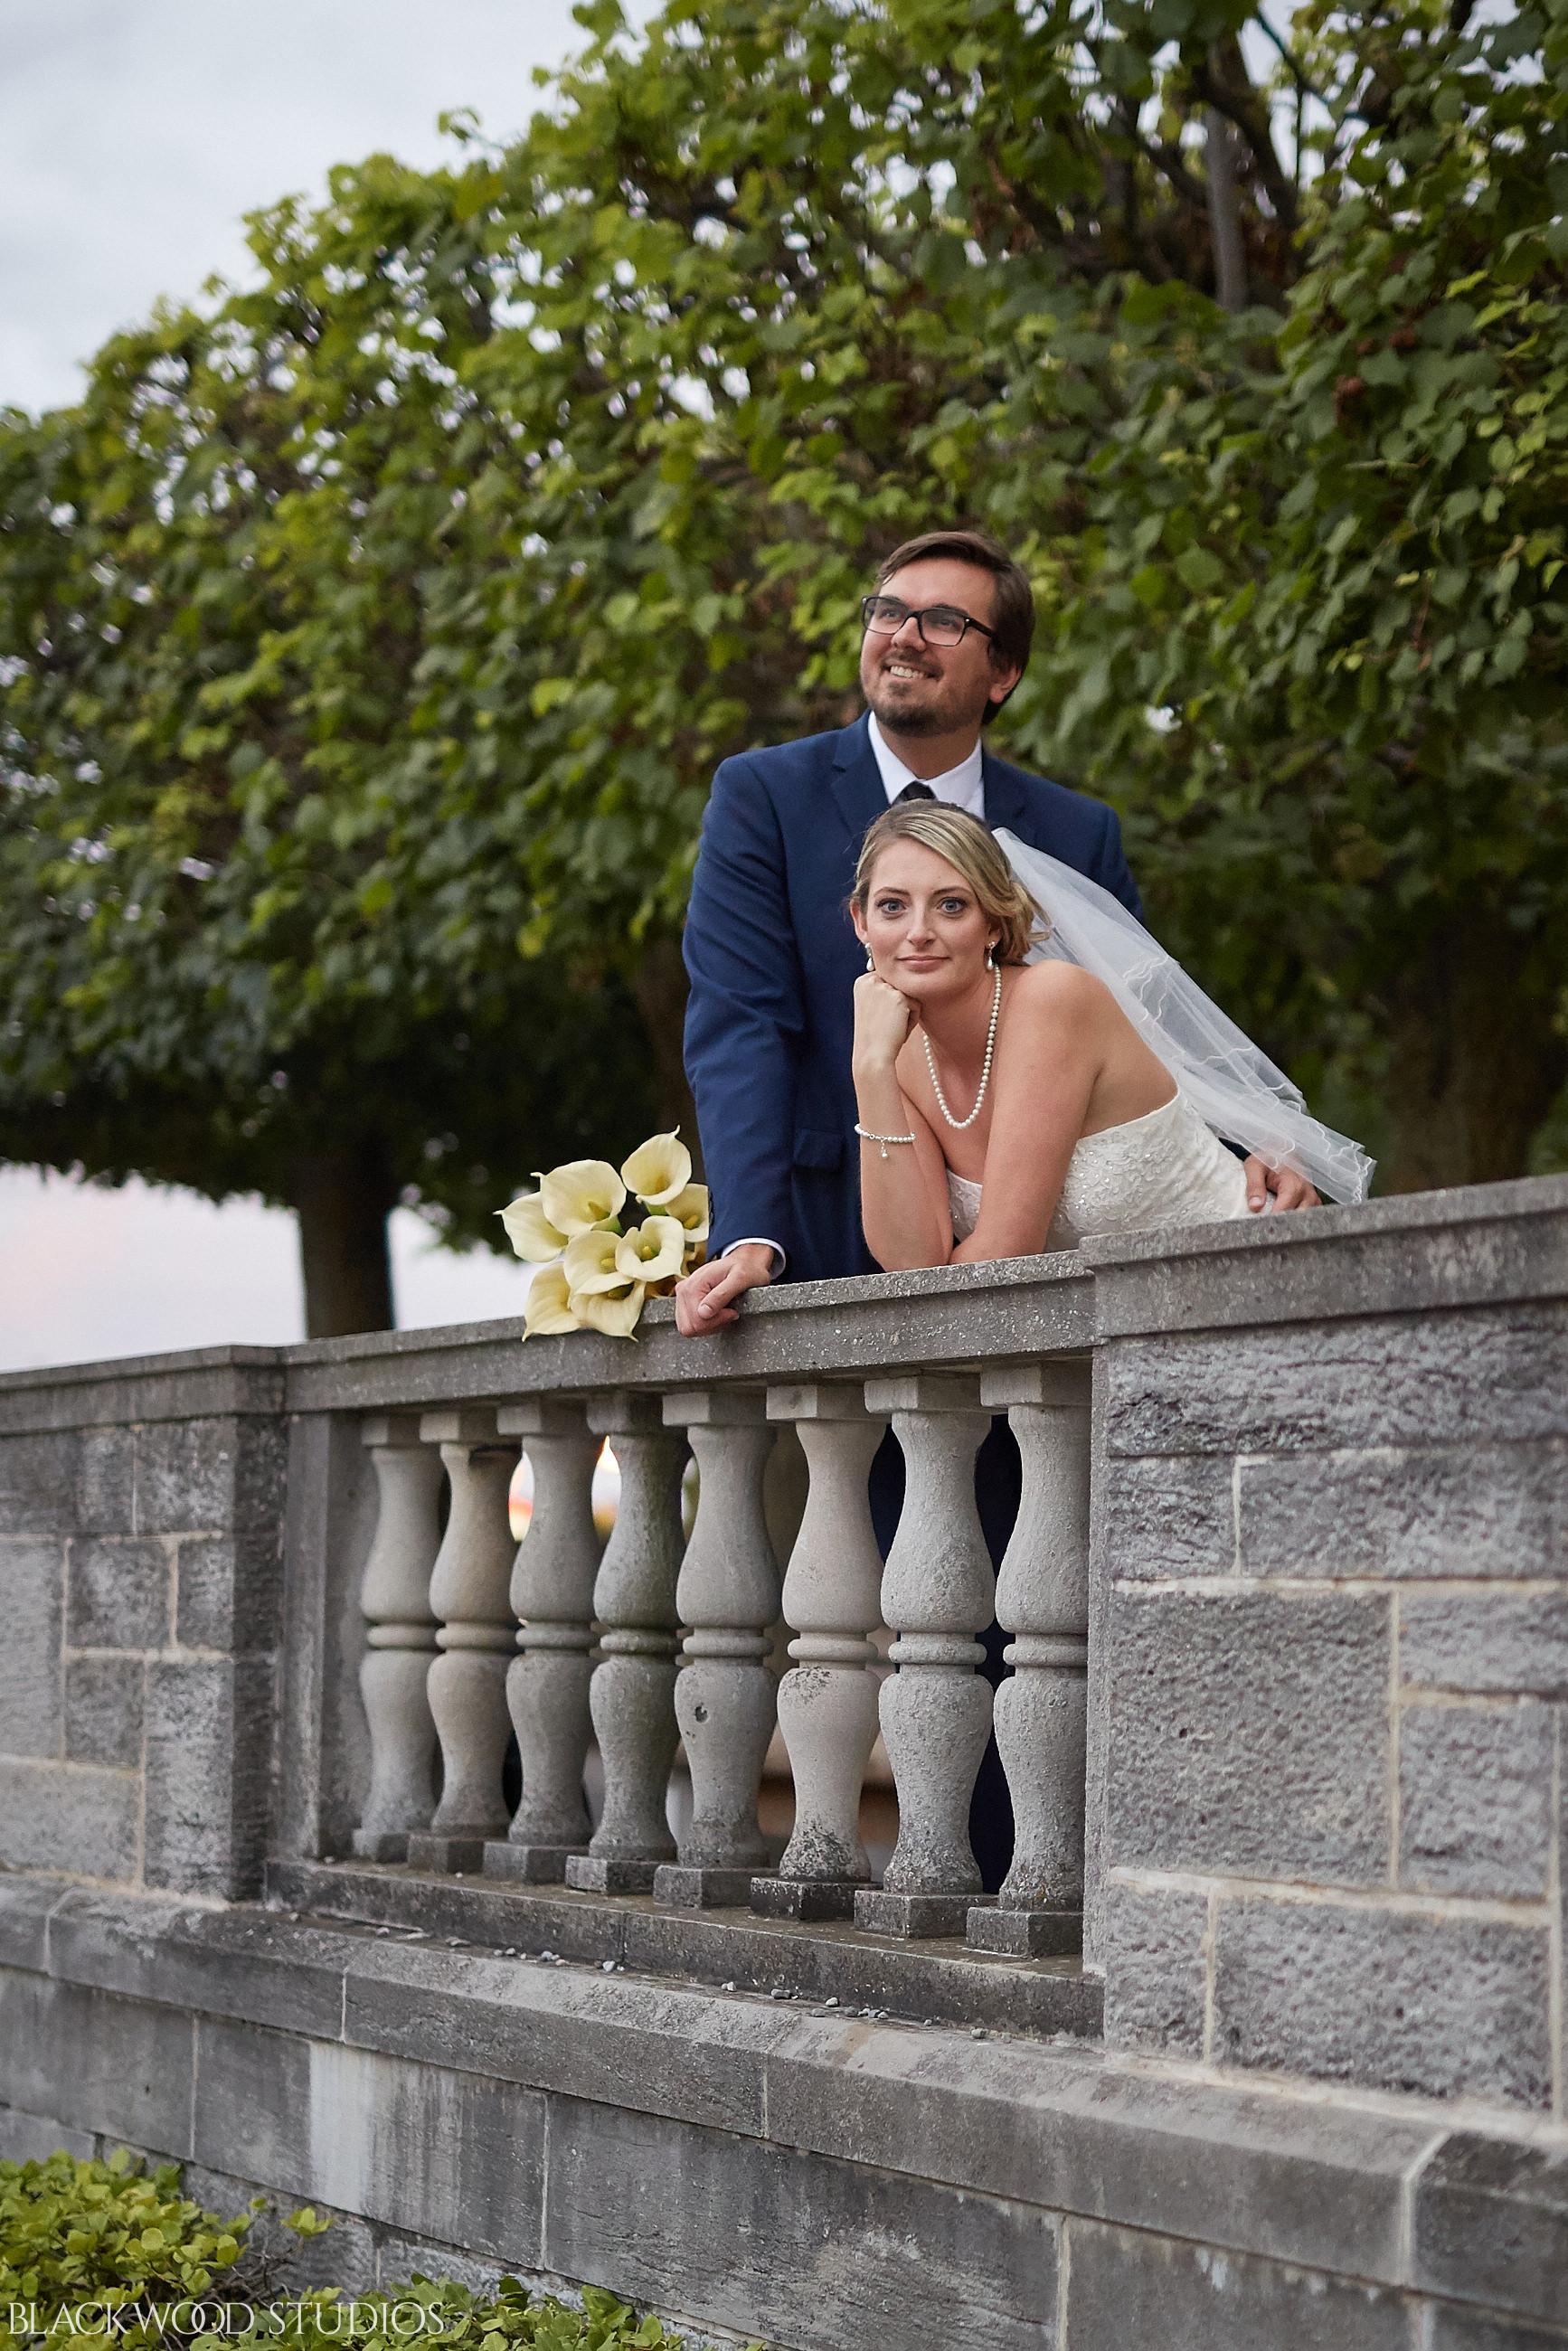 Blackwood-Studios-Wedding-Photography-20170928-185937-Marek-Katie-Michalek-Oakes-Garden-Theatre-Niagara-Falls-Ontario-Canada.jpg